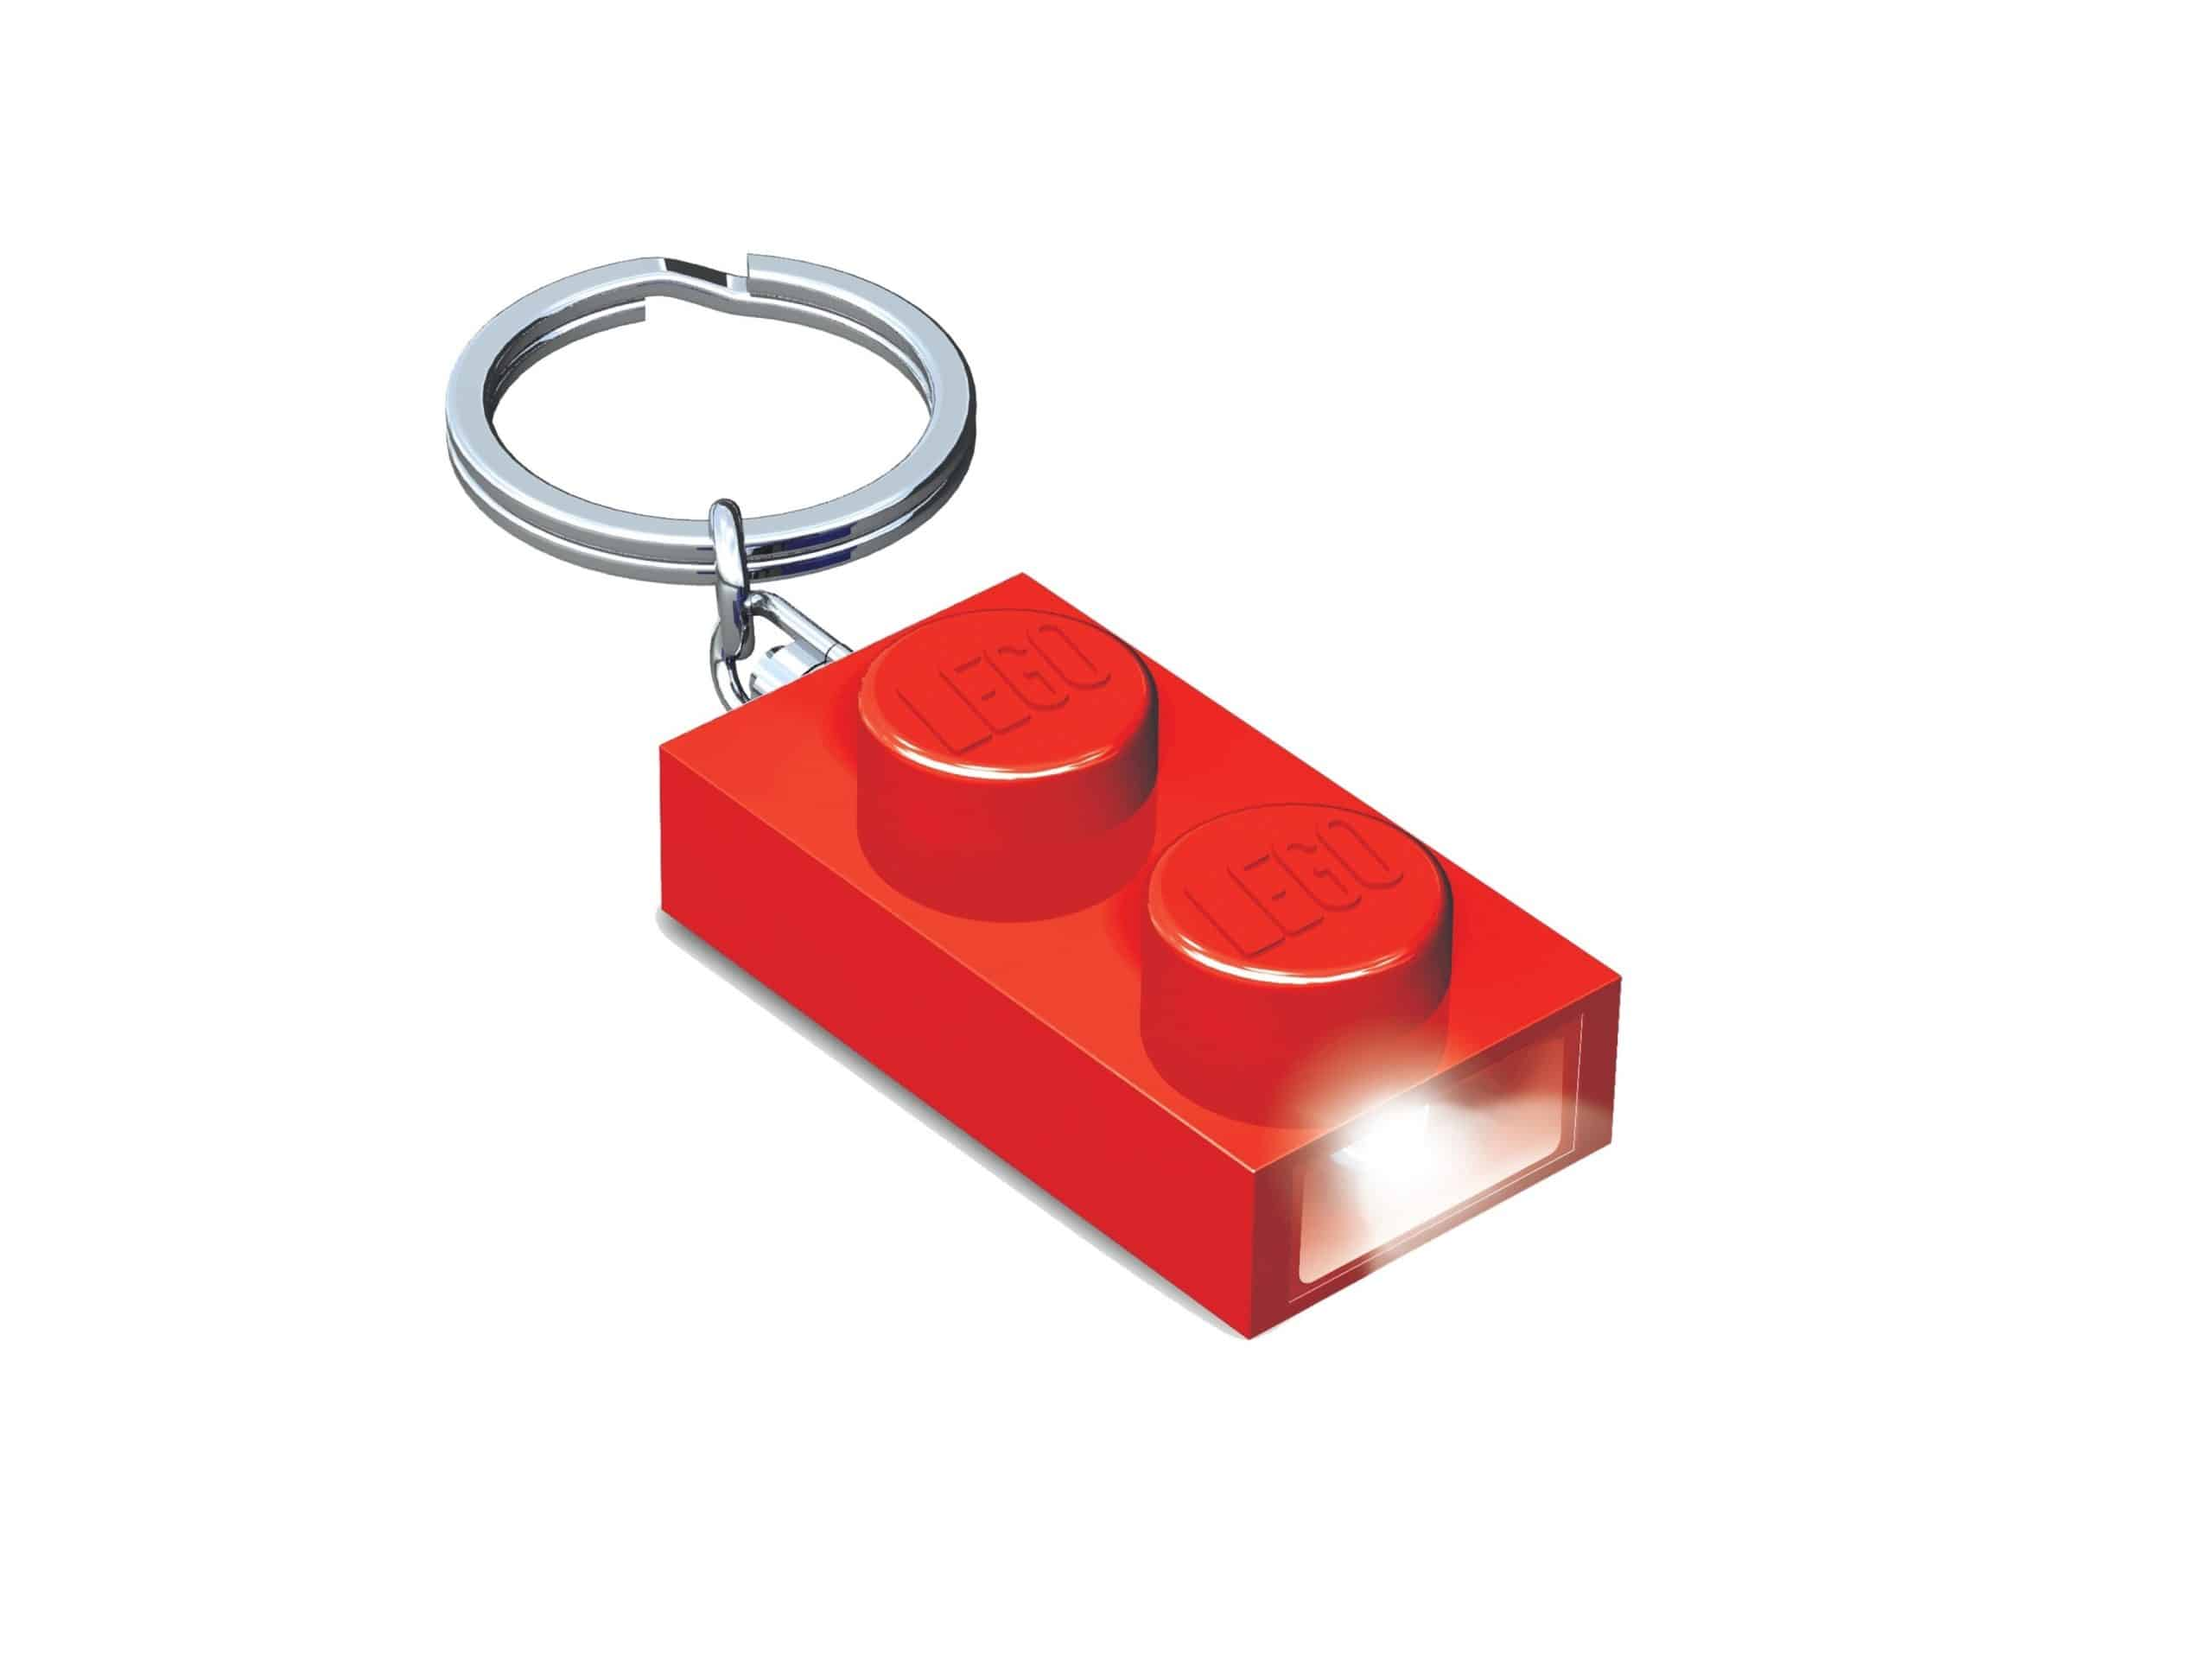 lego 5004264 1x2 red brick key light scaled